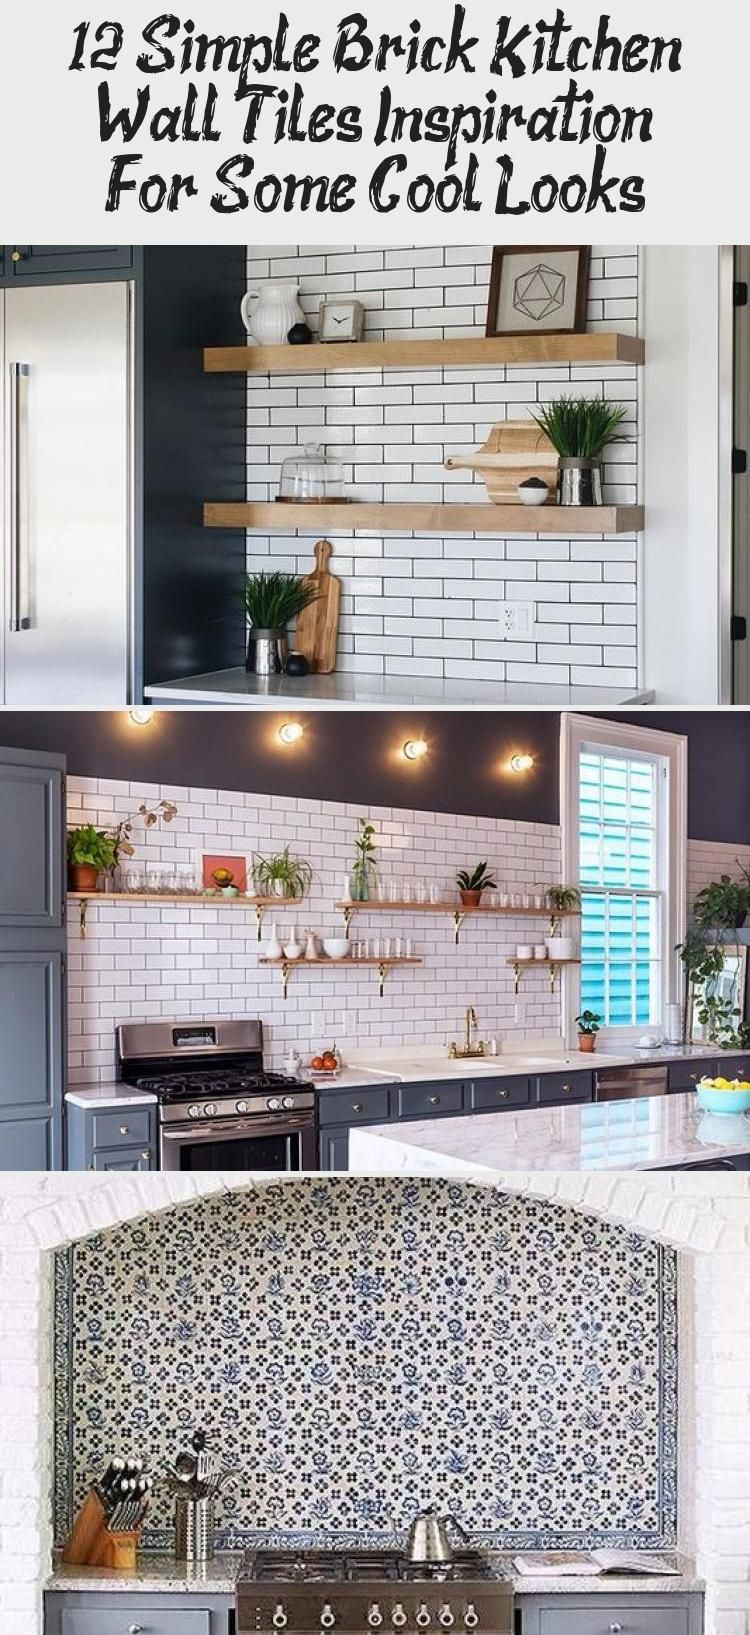 12 Simple Brick Kitchen Wall Tiles Inspiration For Some Cool Looks Decoration In 2020 Kitchen Wall Tiles Brick Kitchen Kitchen Wall